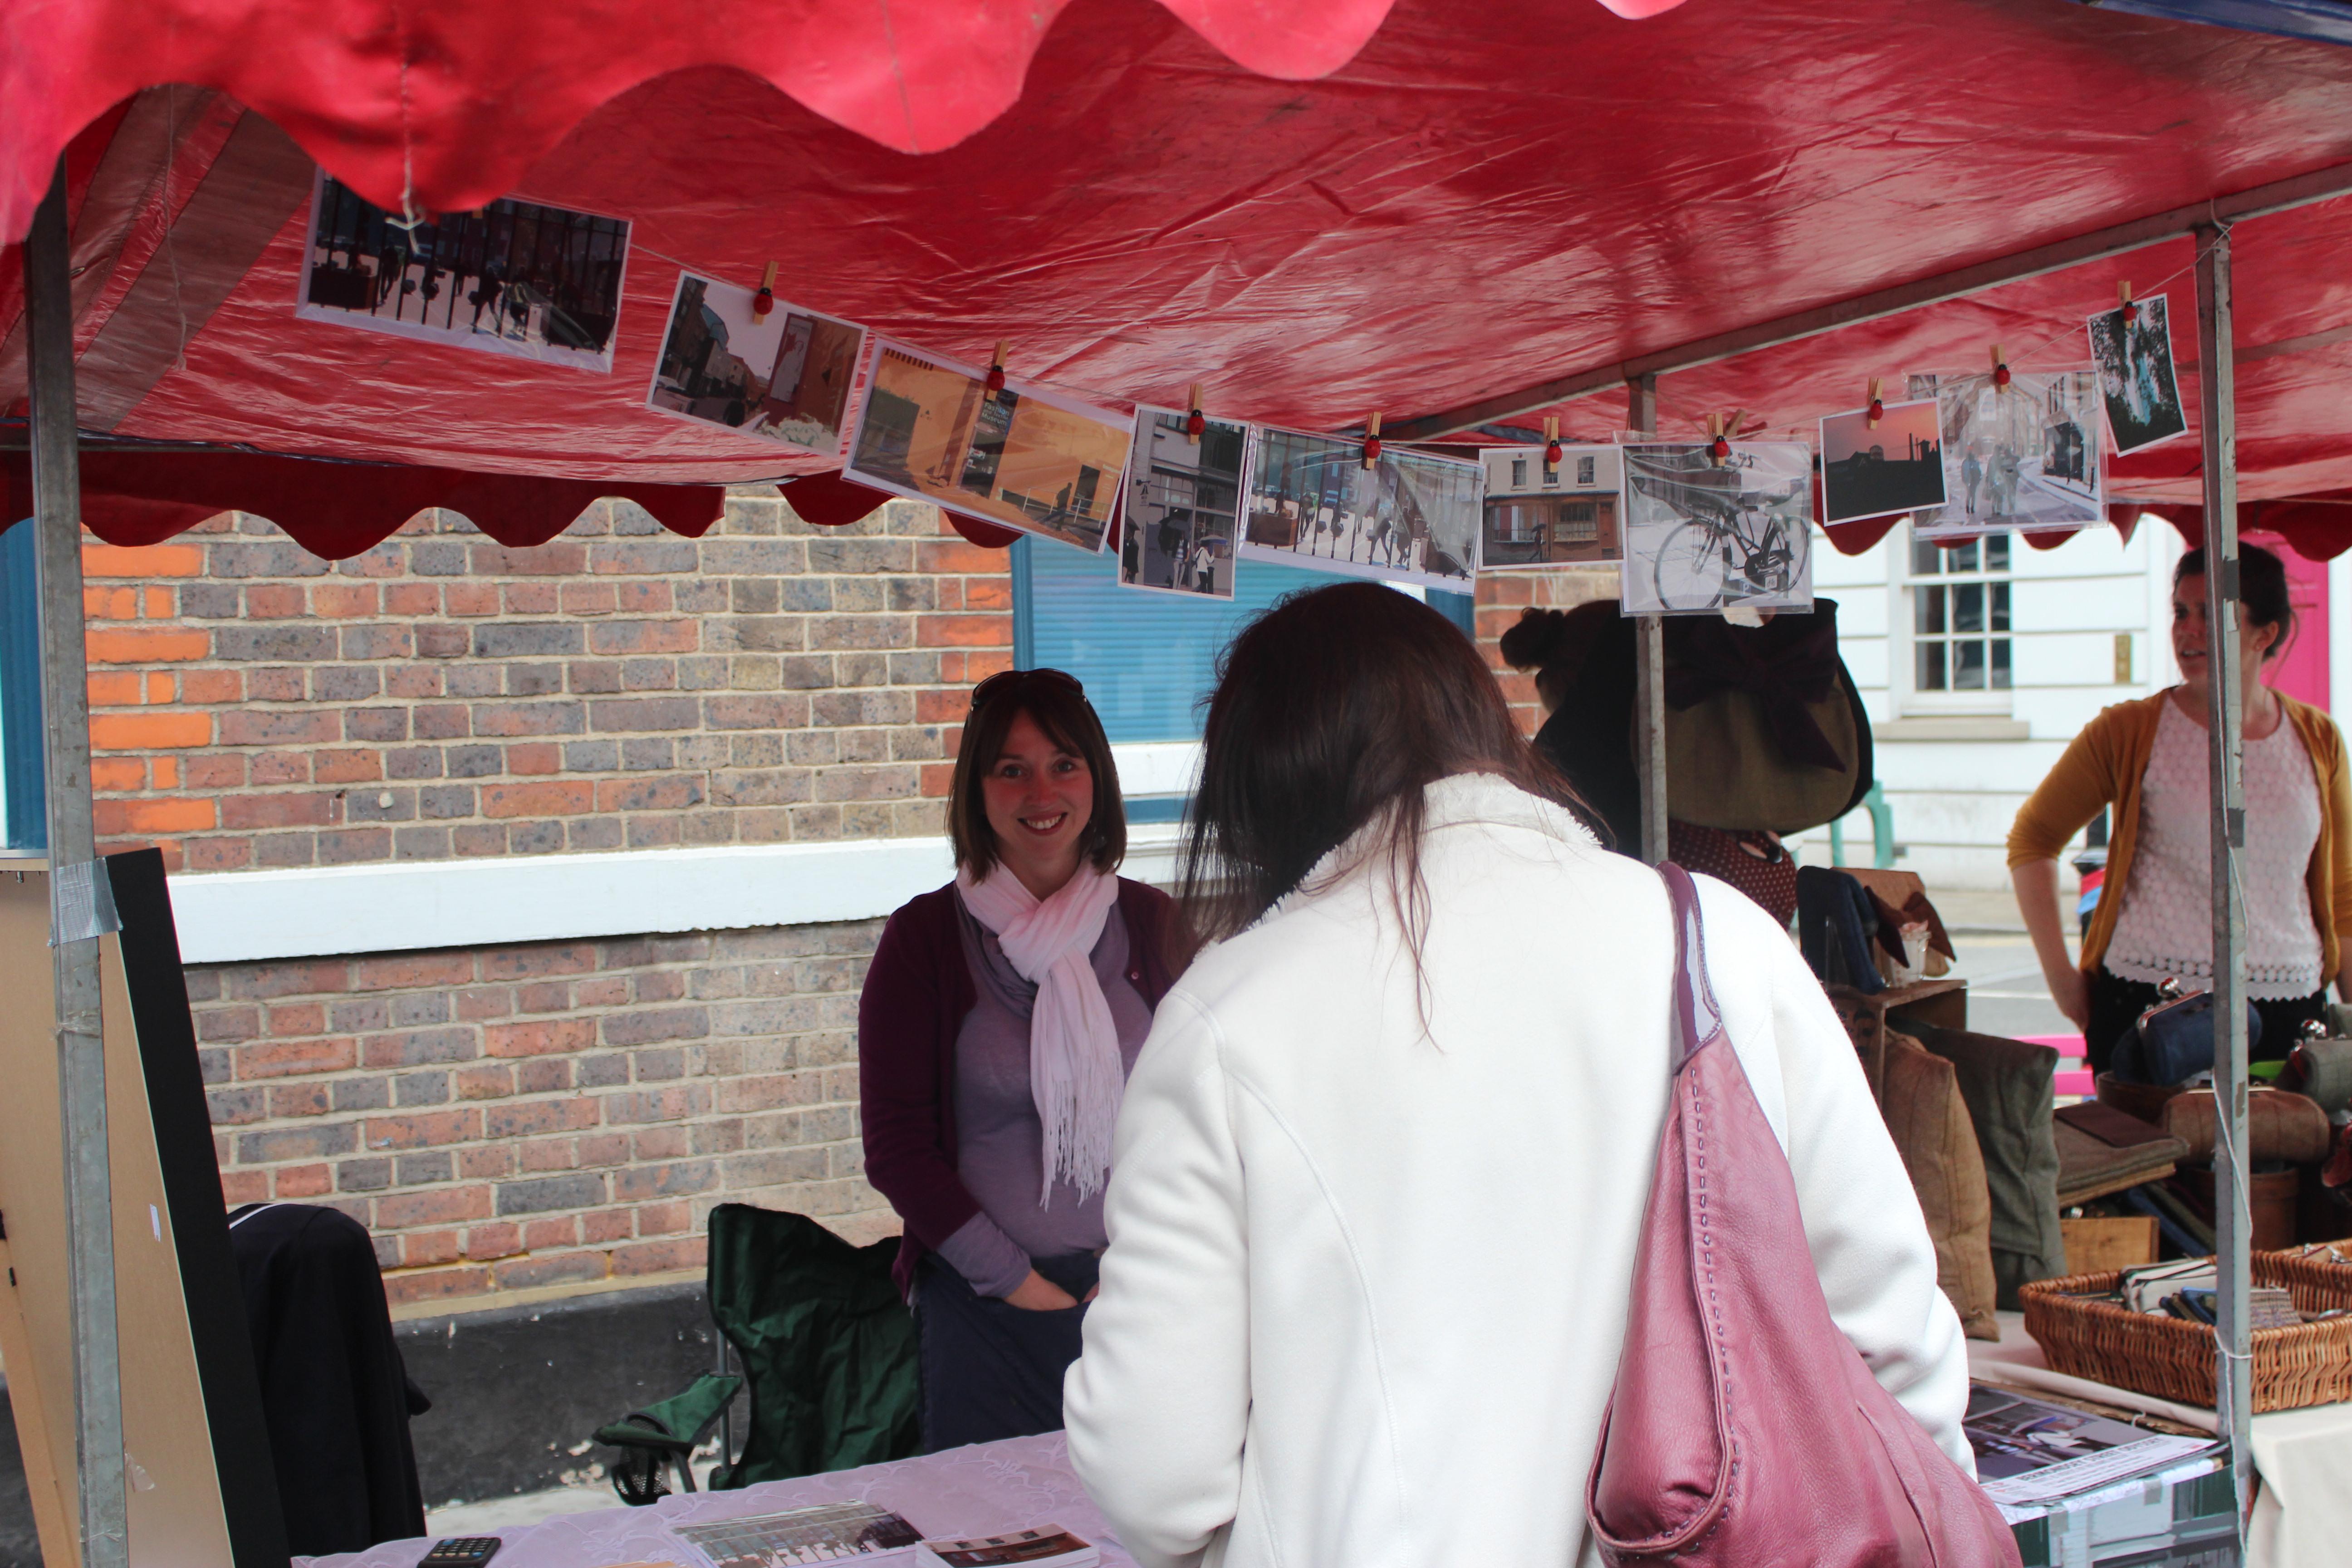 Bermondsey Street Odyssey stall